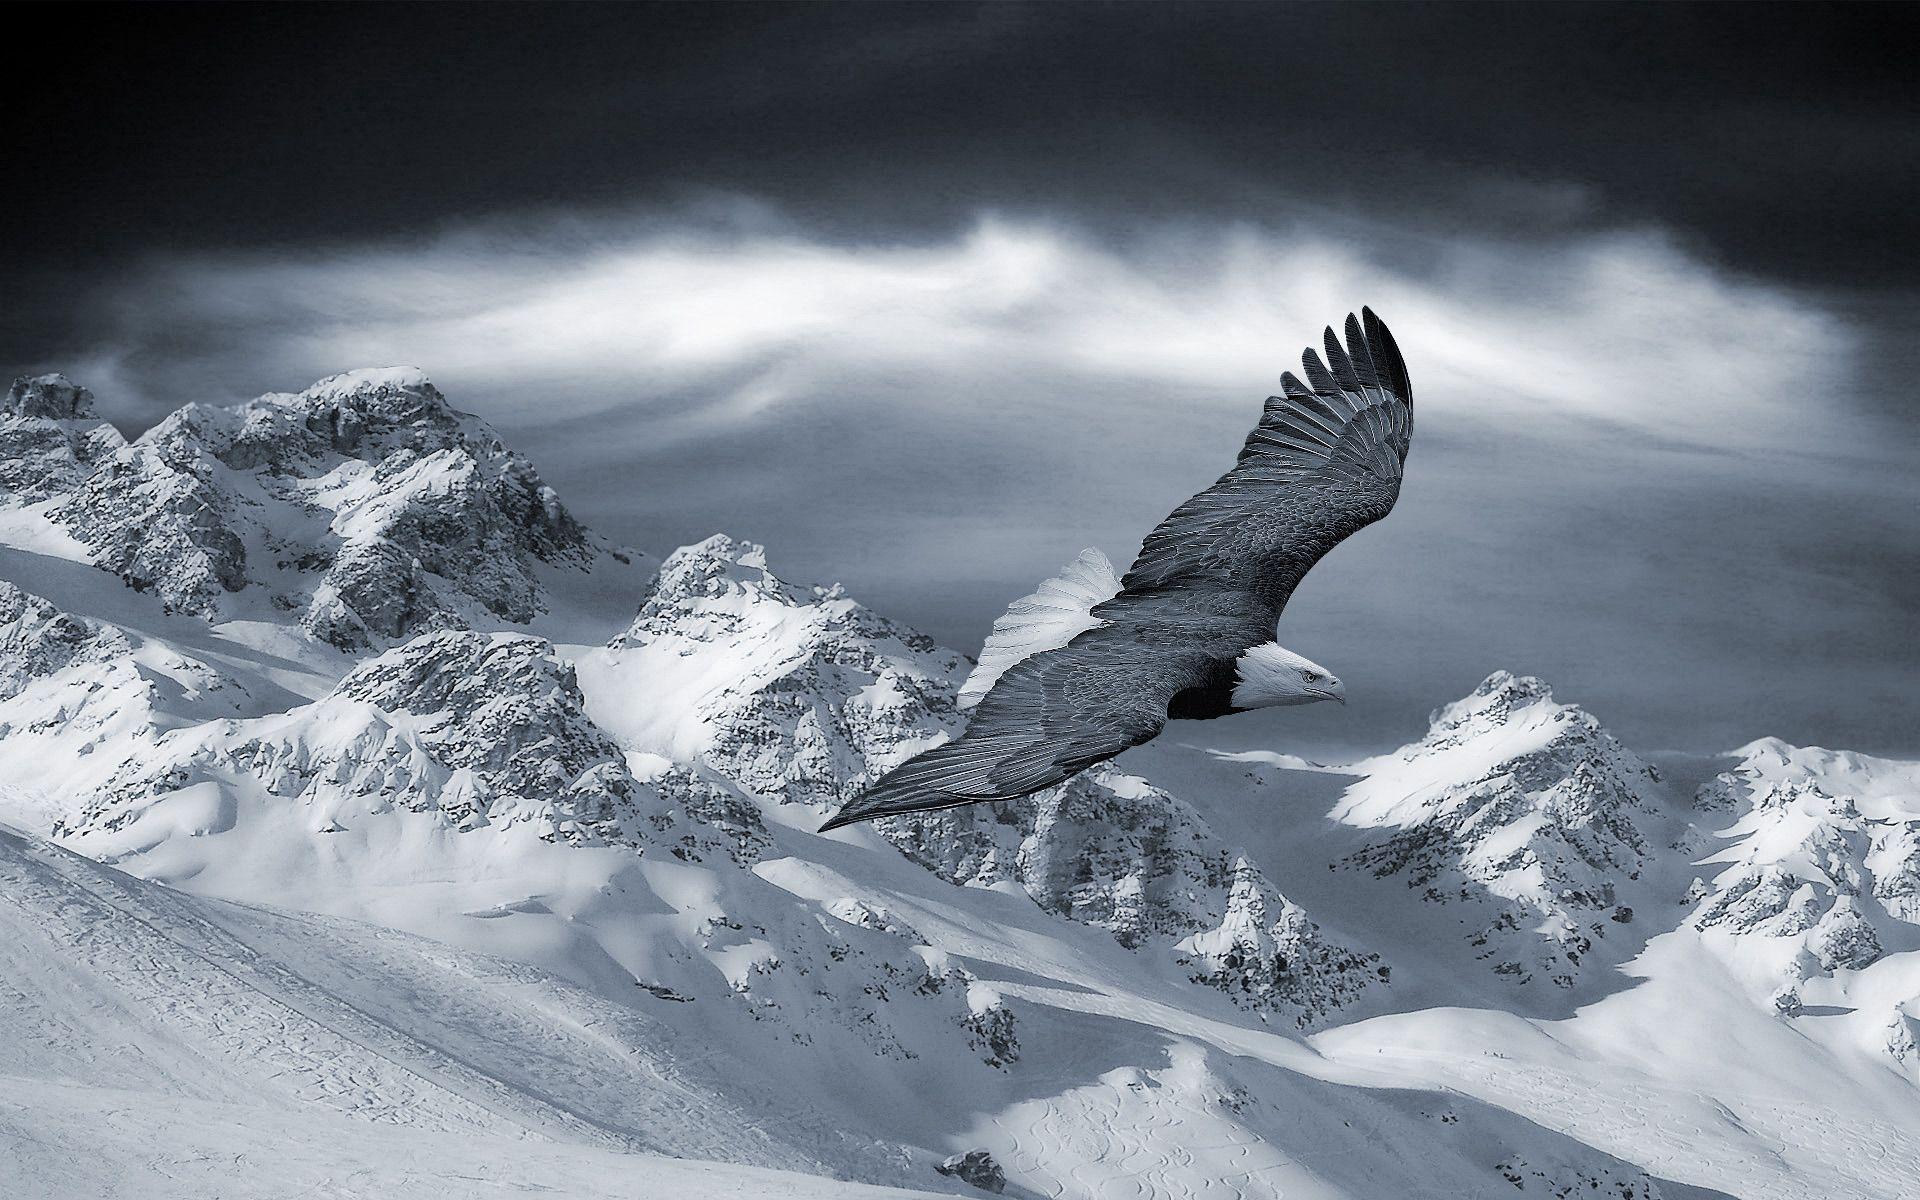 152459 descargar fondo de pantalla Animales, Águila, Cielo, Nieve, Sierras, Loma, Pájaro, Depredador, Montañas: protectores de pantalla e imágenes gratis